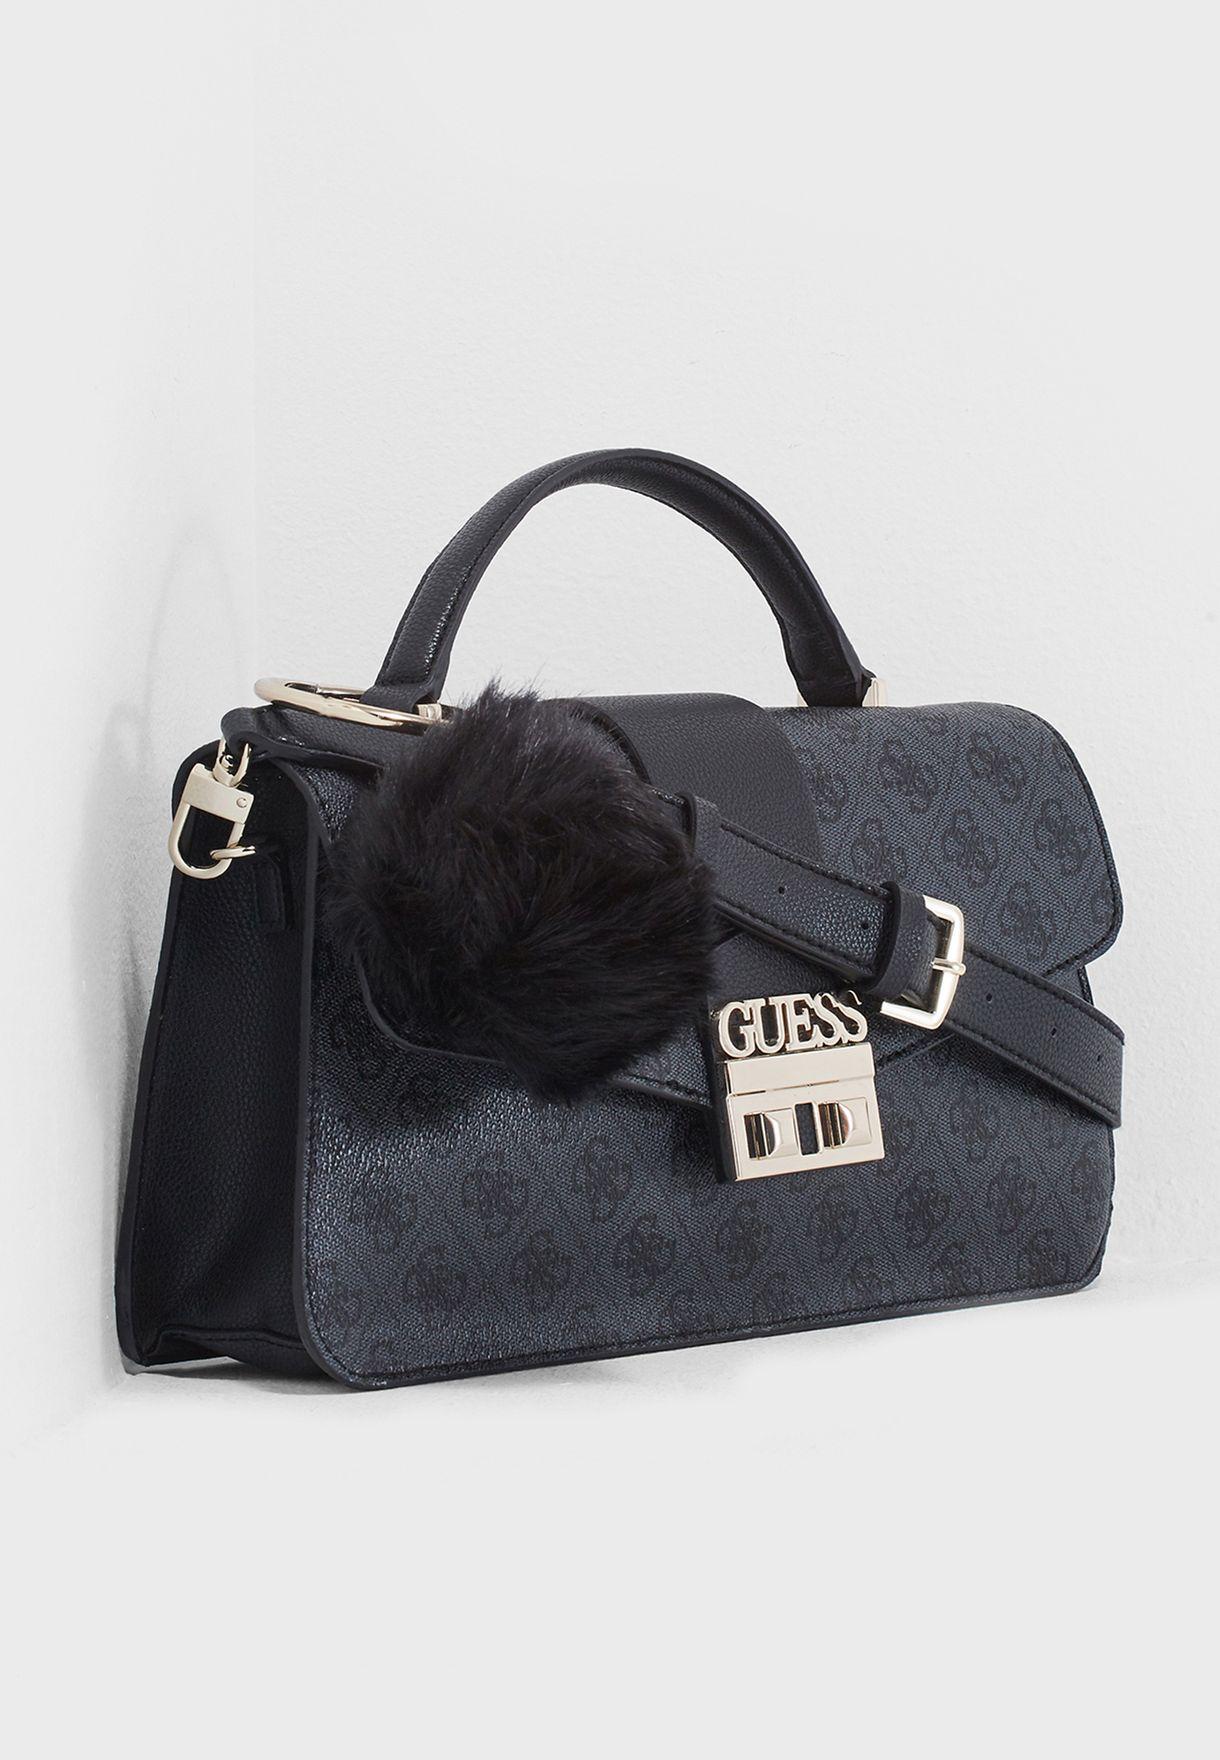 Shop Guess black Luxe Top Handle Flap Satchel SG710218COA for Women ... 782279eb38